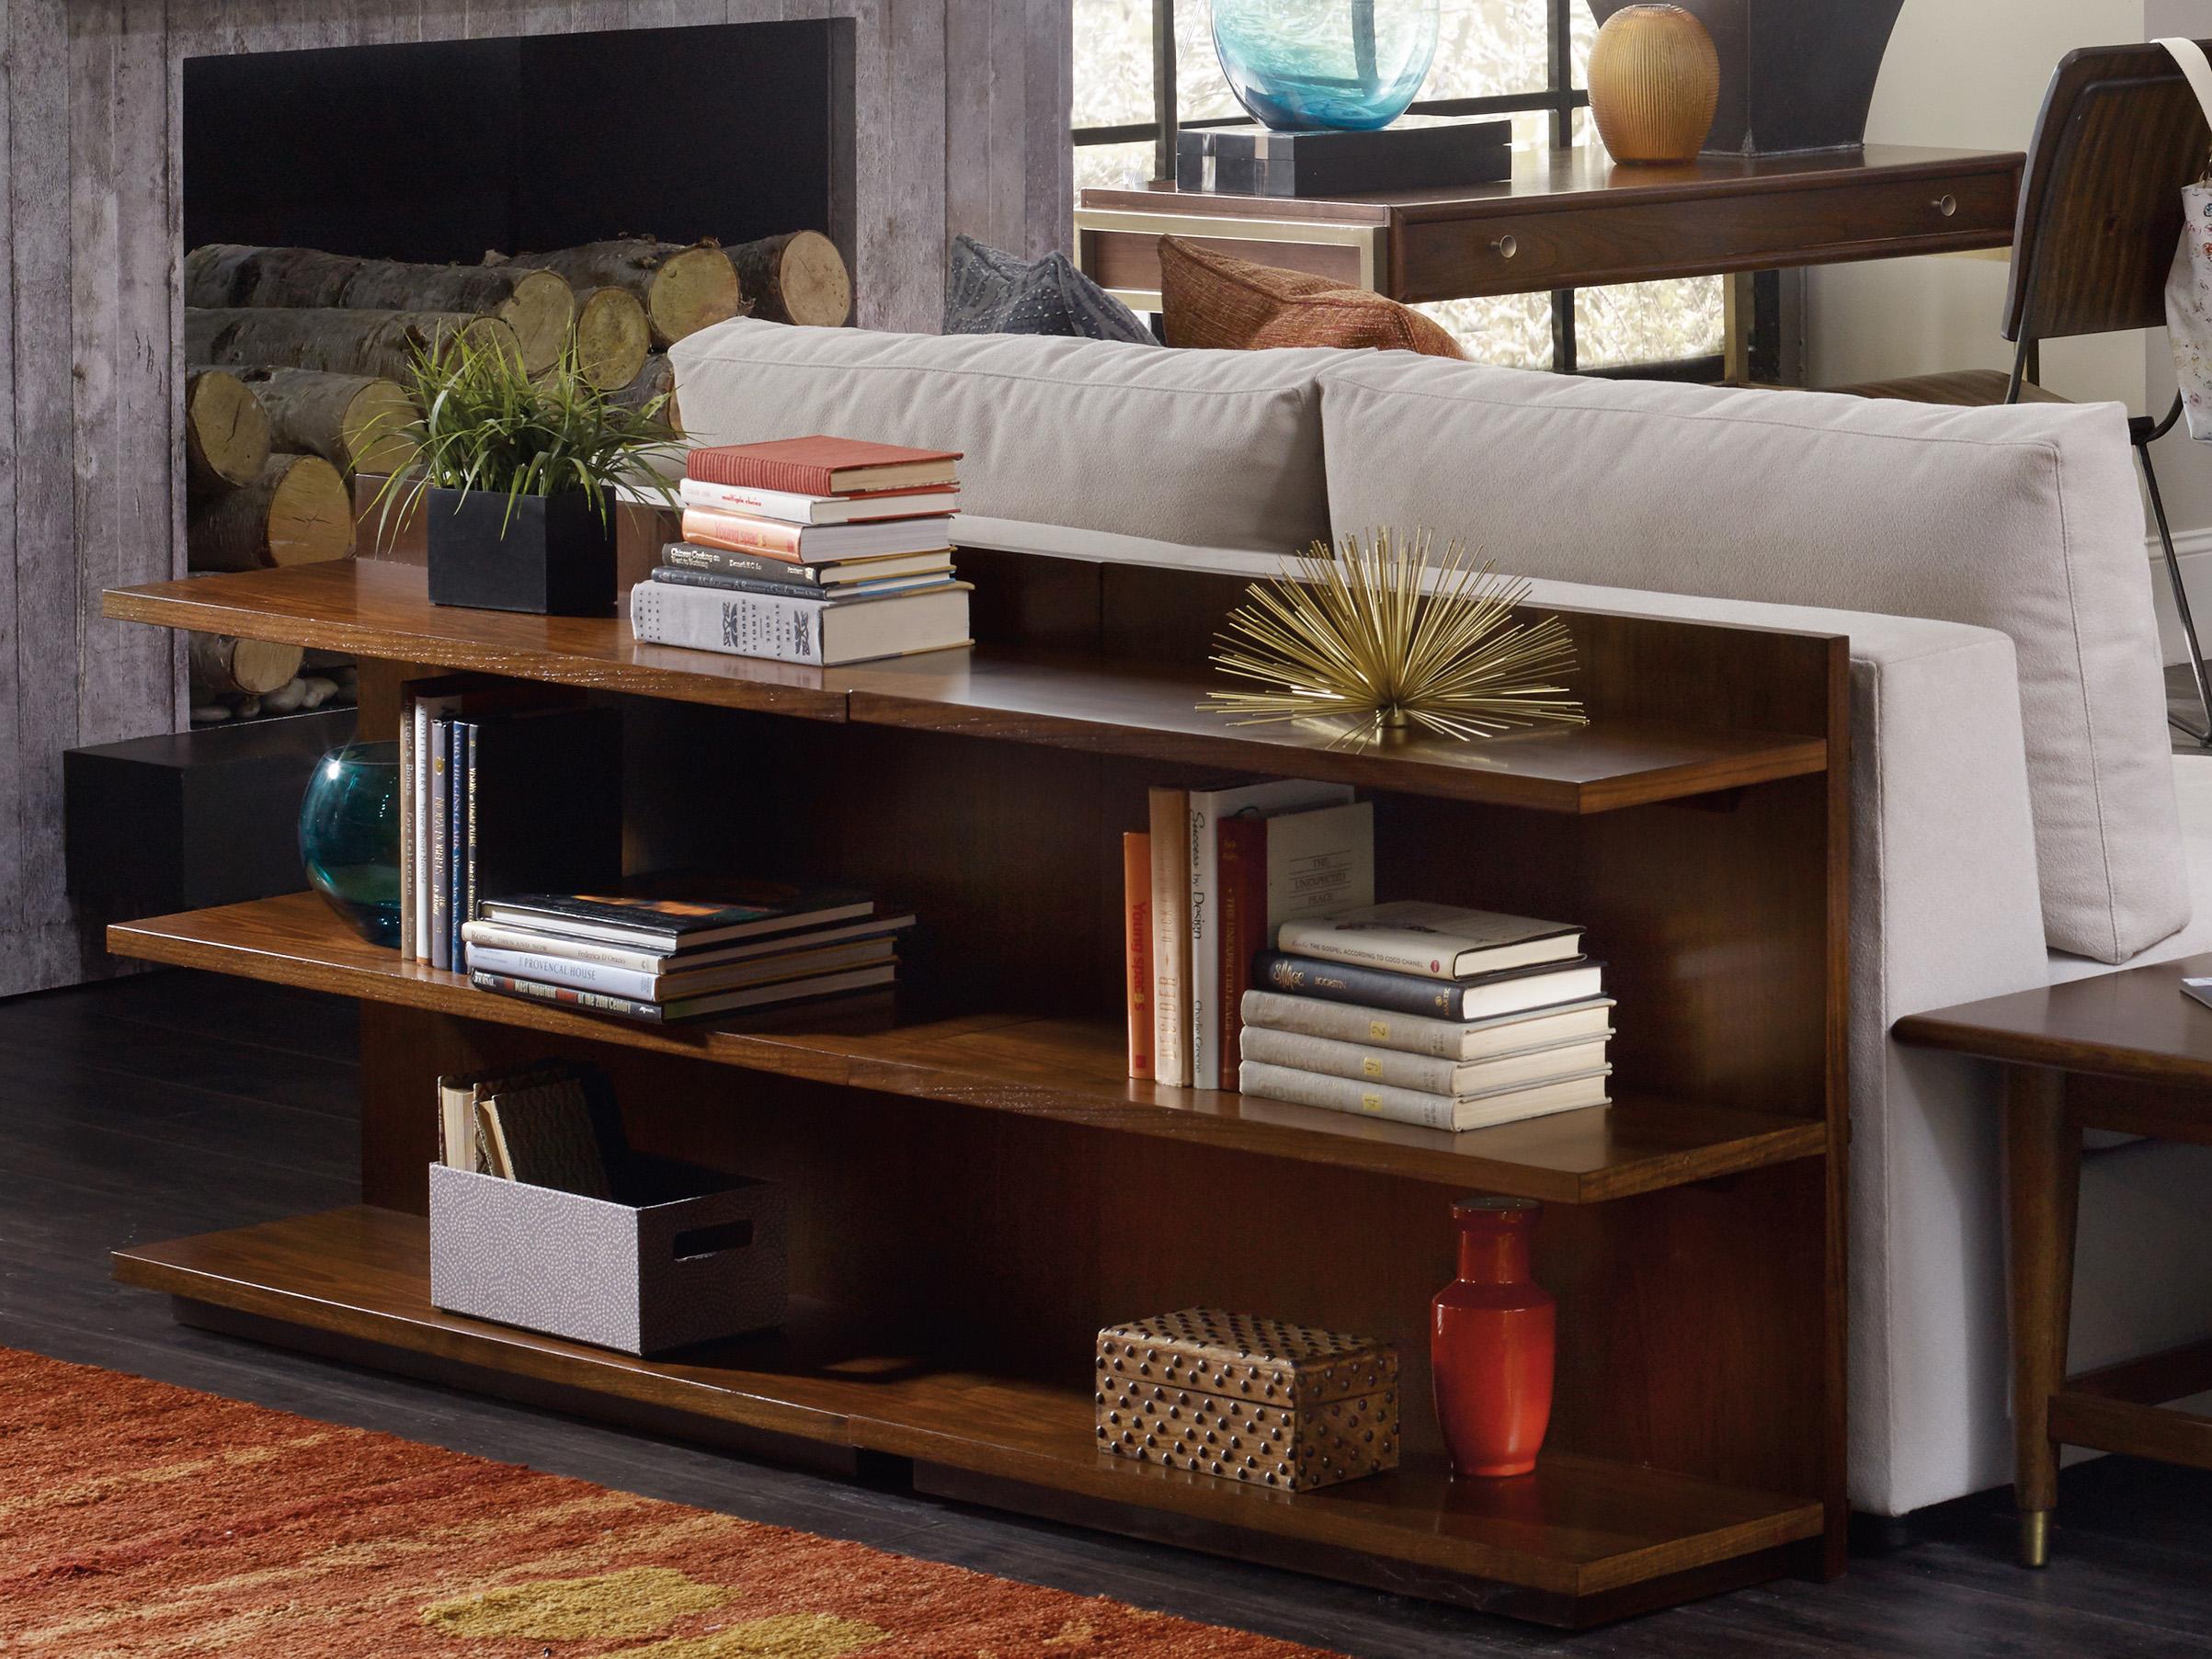 Hooker Furniture Studio 7h Medium Wood Bookcase Console